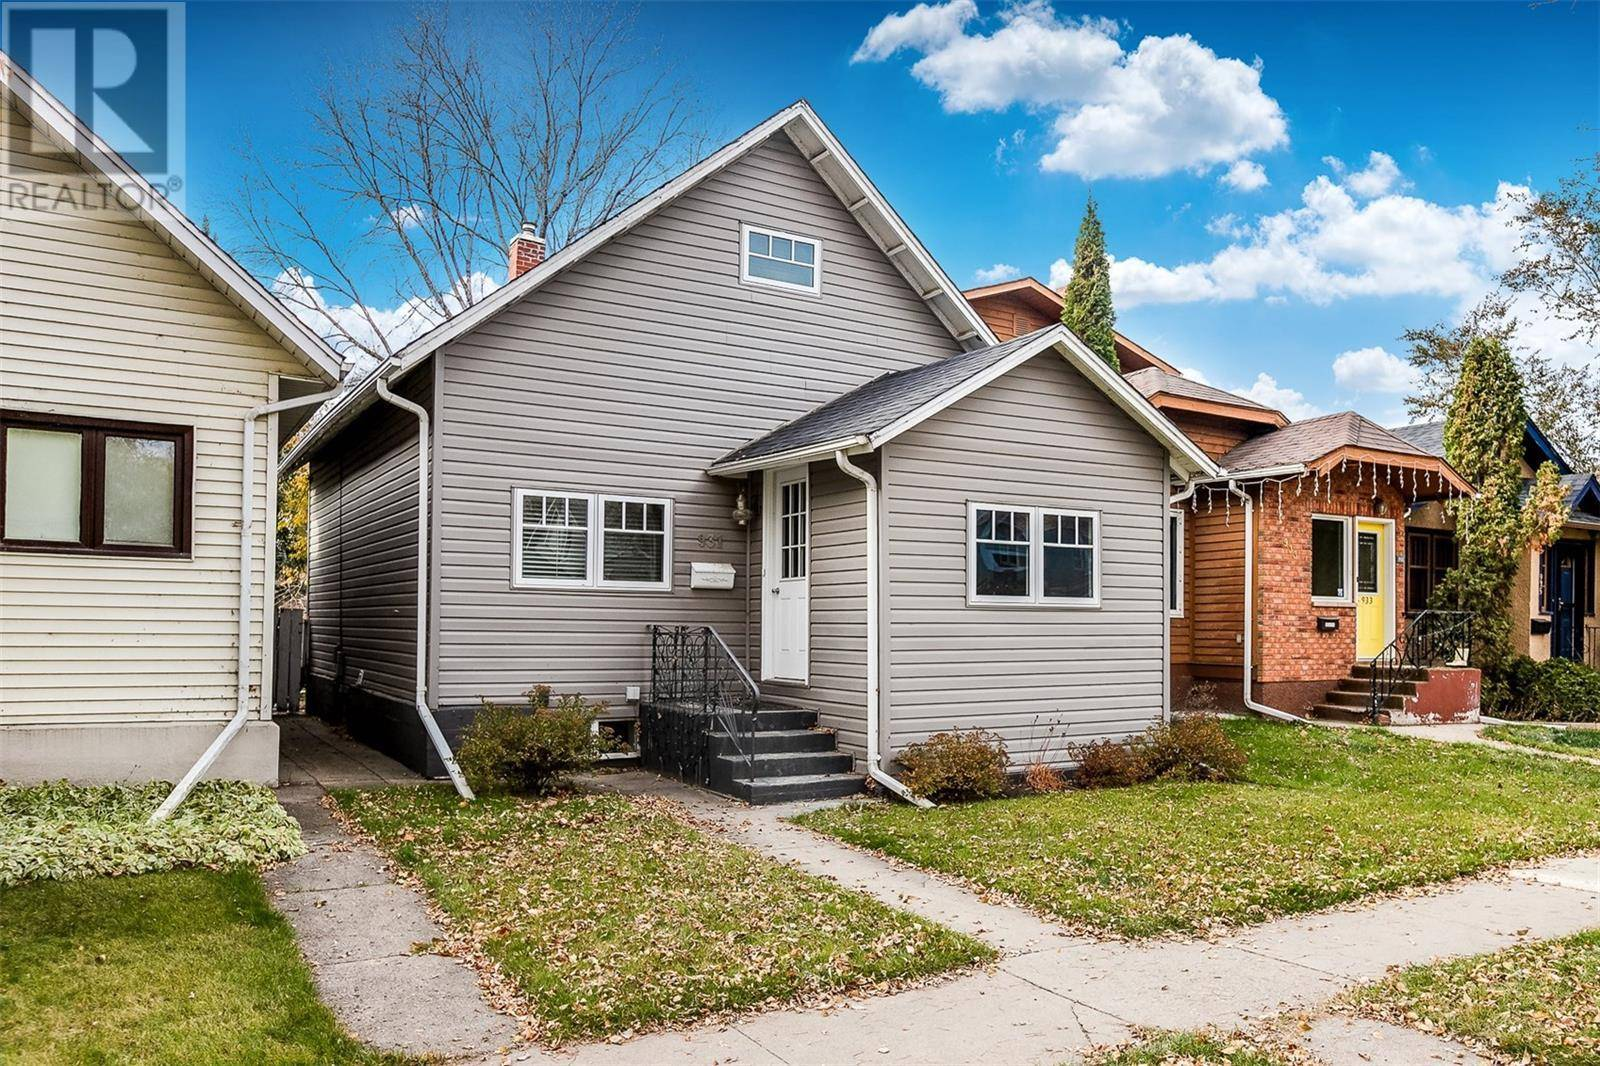 House for sale at 931 9th Ave N Saskatoon Saskatchewan - MLS: SK789557